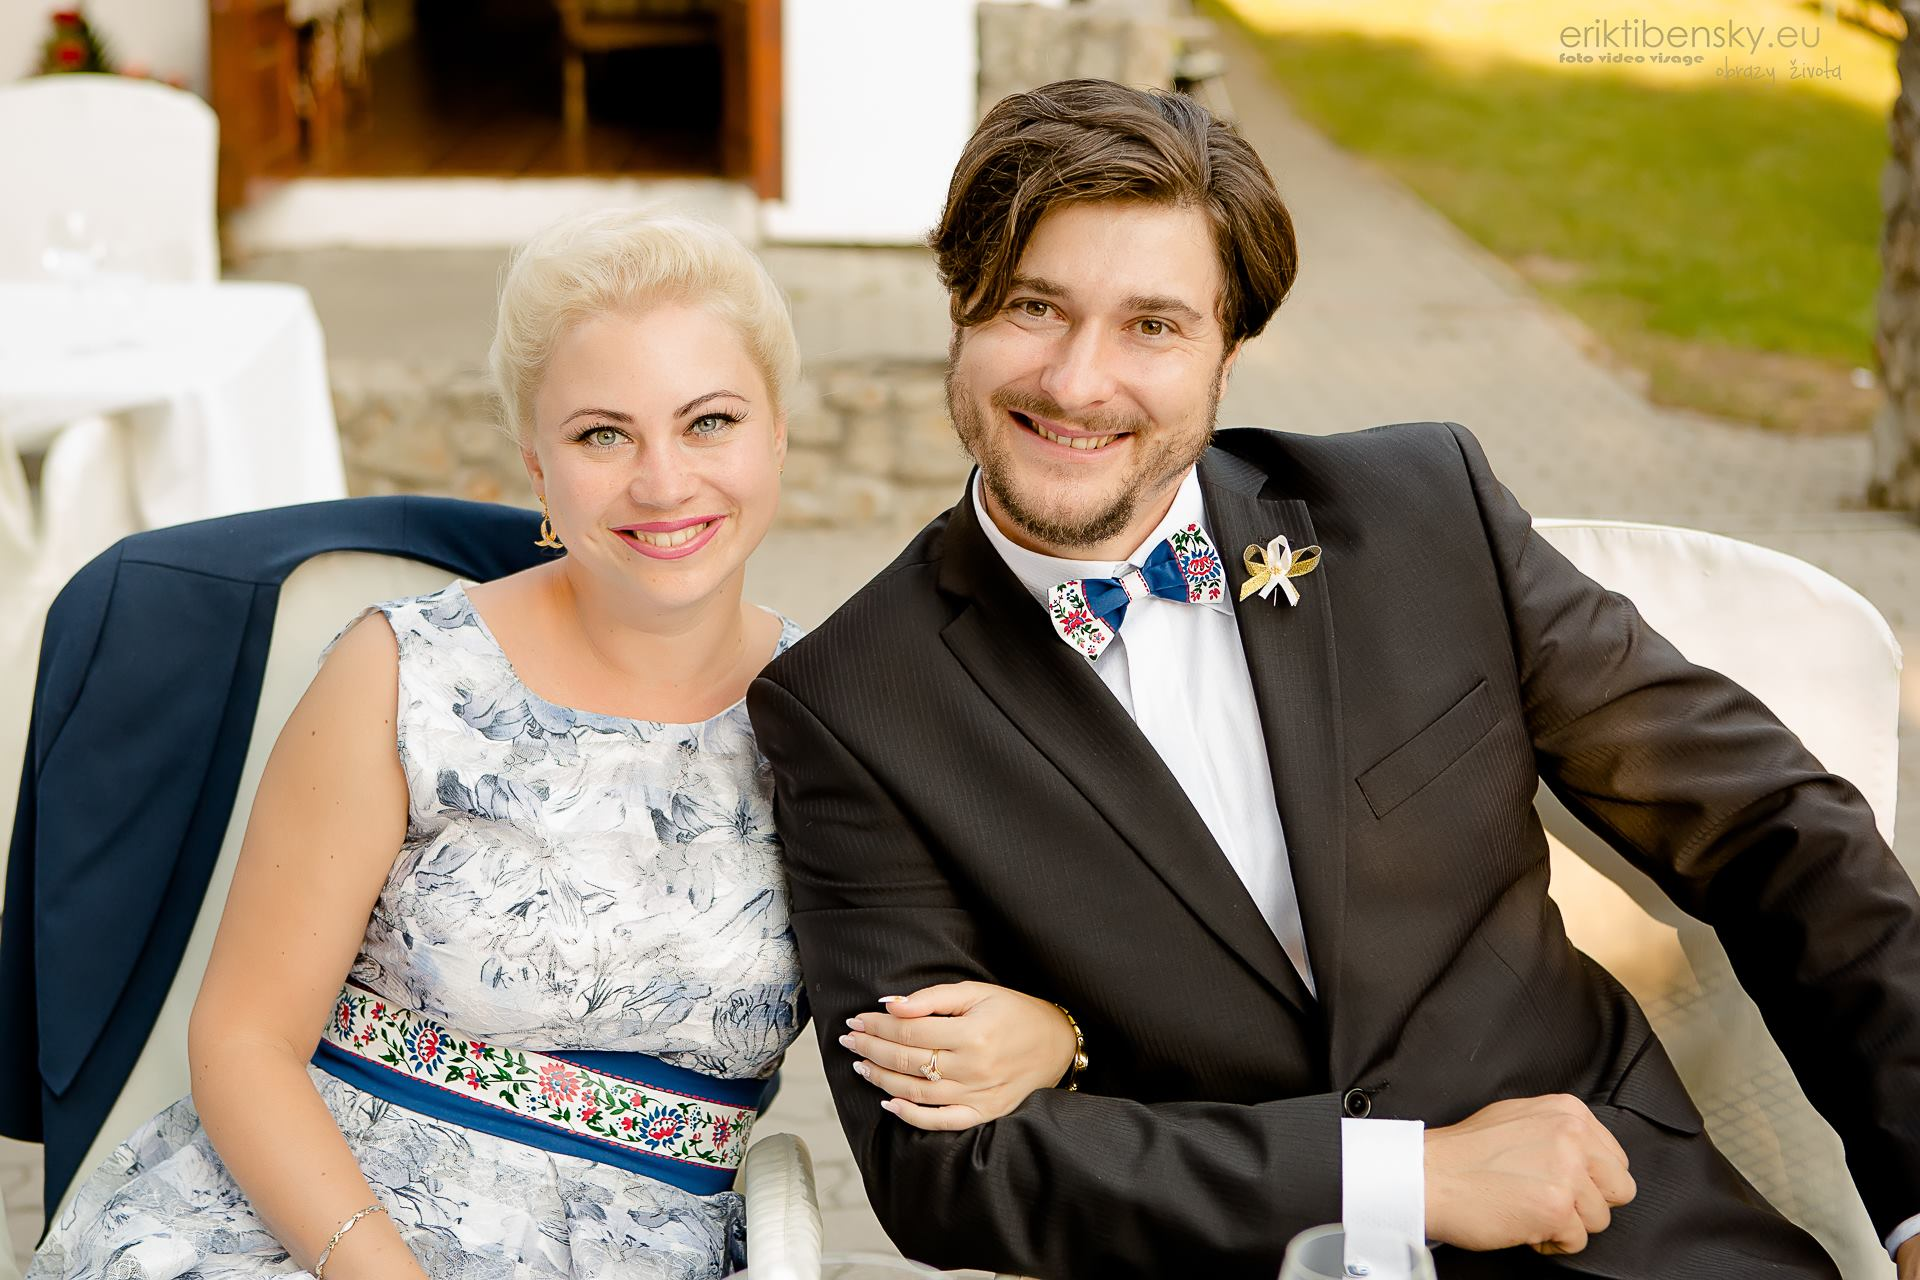 eriktibensky-eu-svadobny-fotograf-wedding-photographer-3049